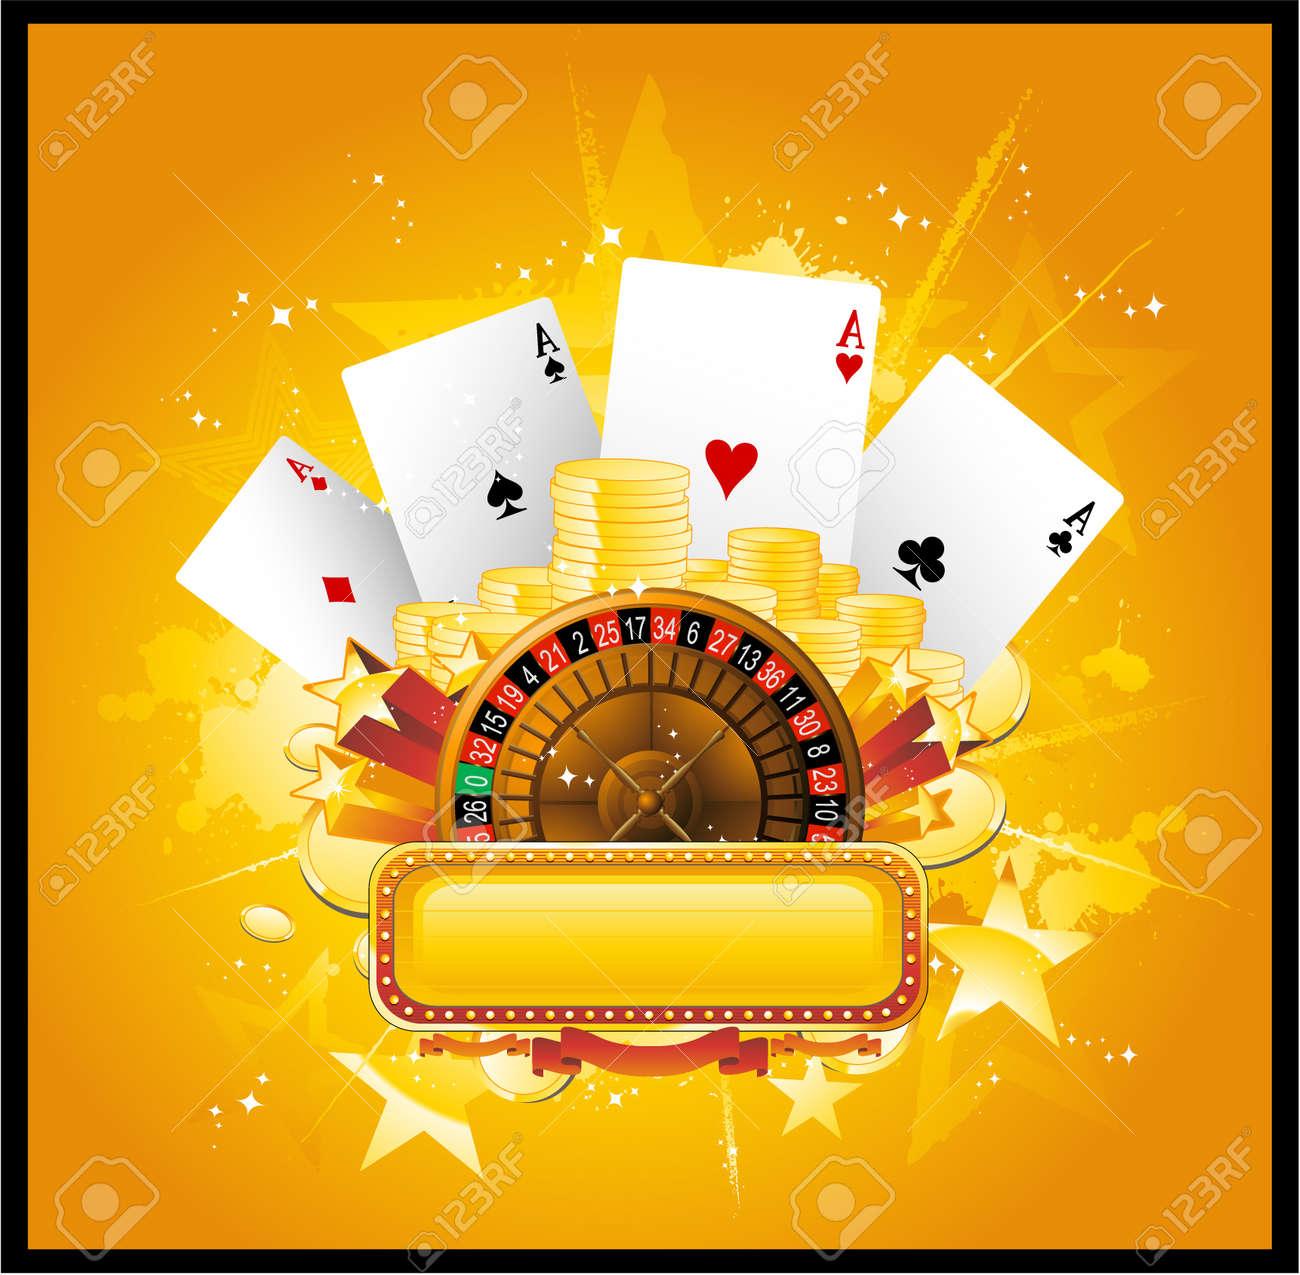 Casino poker neon sign Stock Vector - 8651339